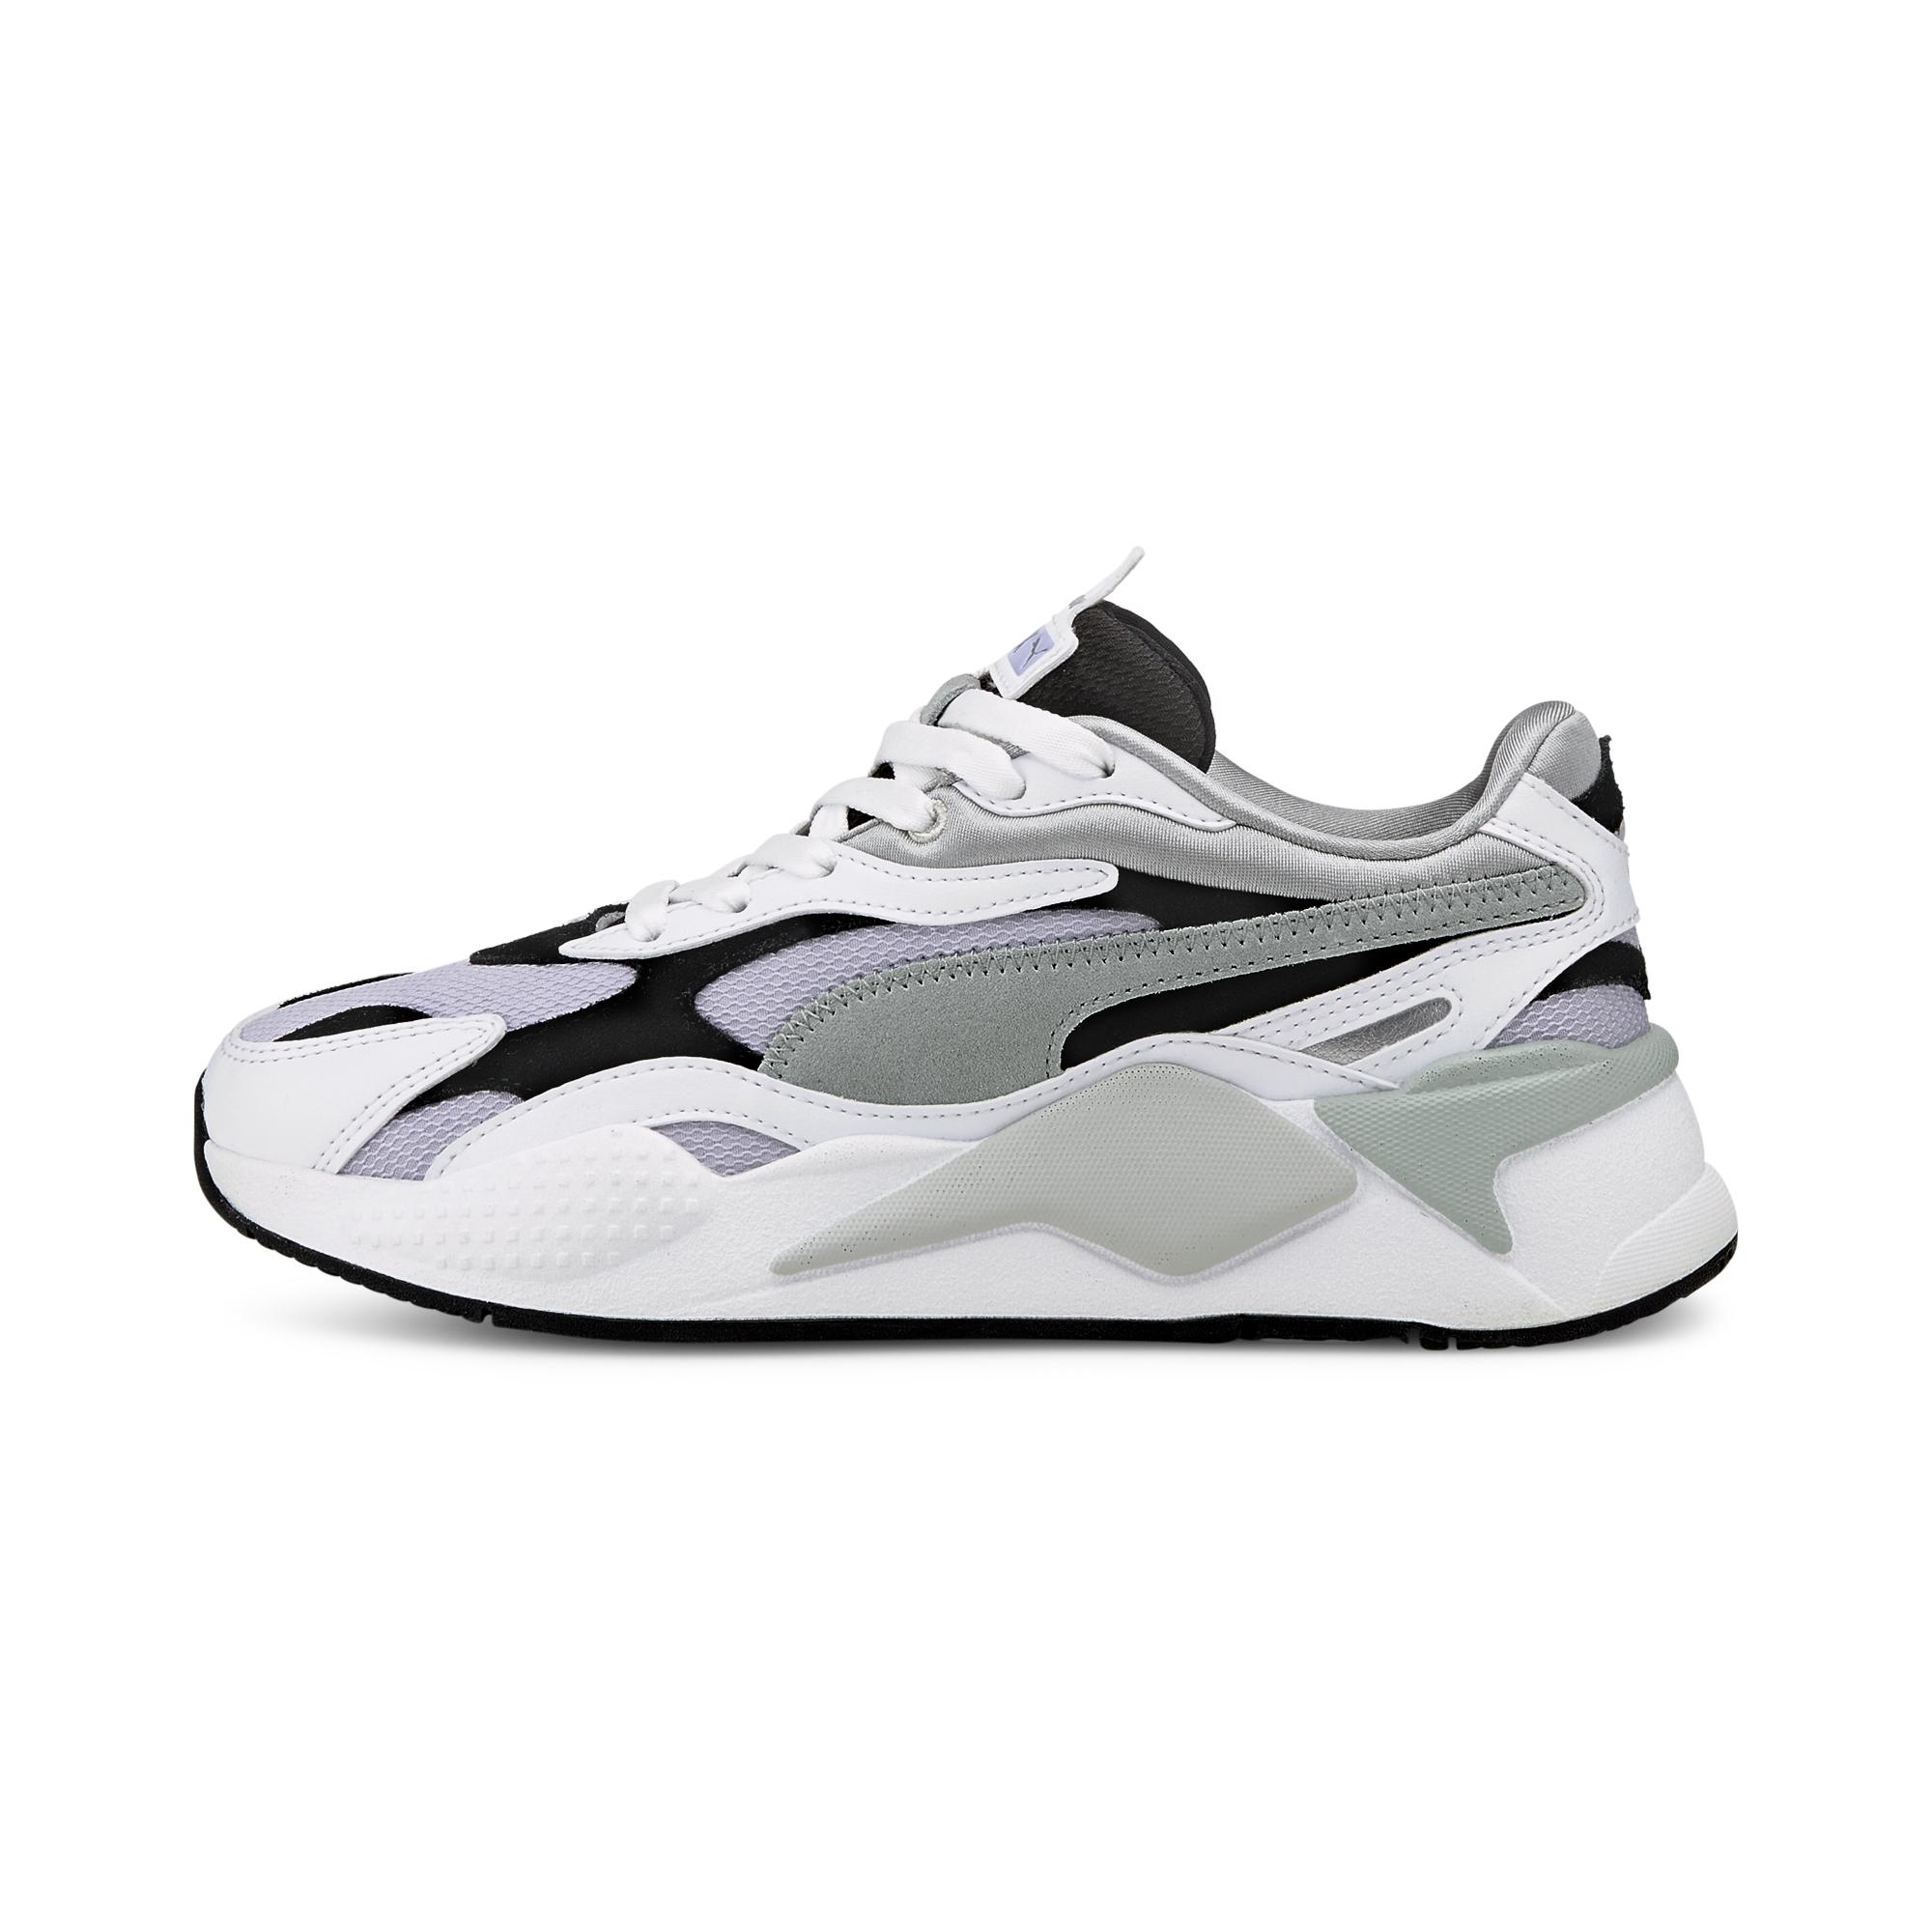 "Dámske topánky a tenisky Puma RS-X³ Layers Wn""s Purple Heather-Puma White"